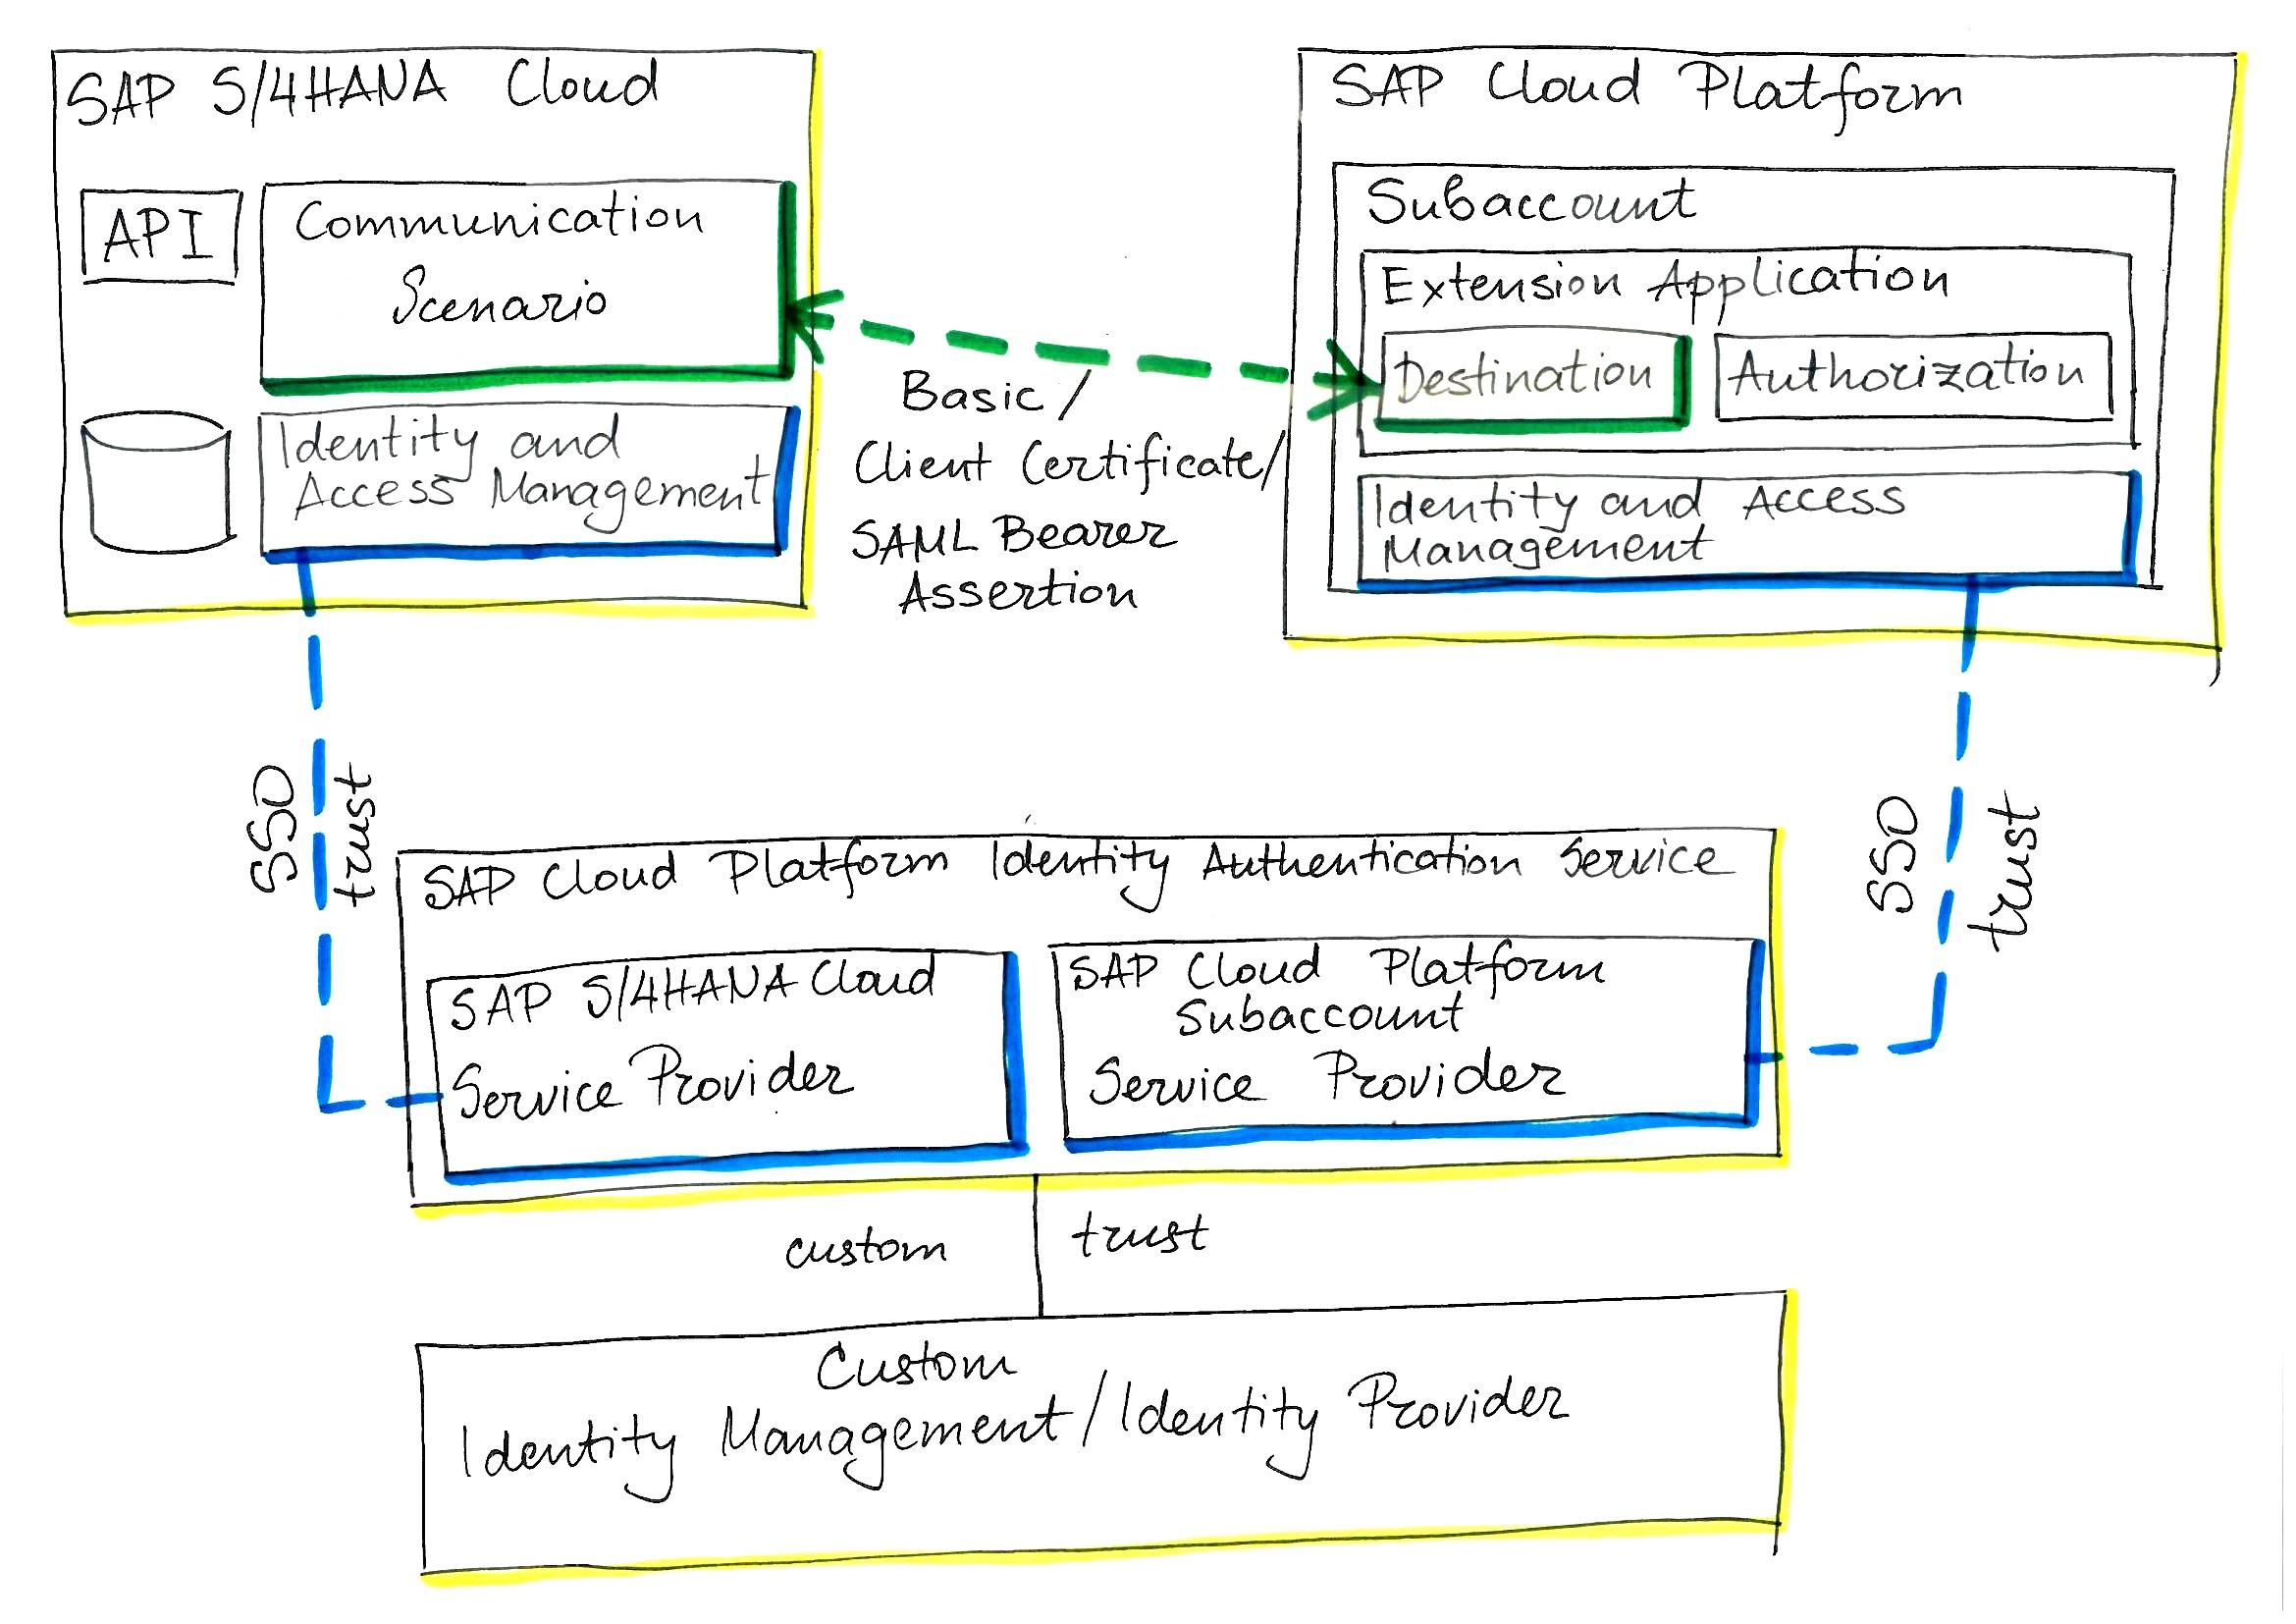 sap activate methodology for sap s/4hana cloud single tenant edition